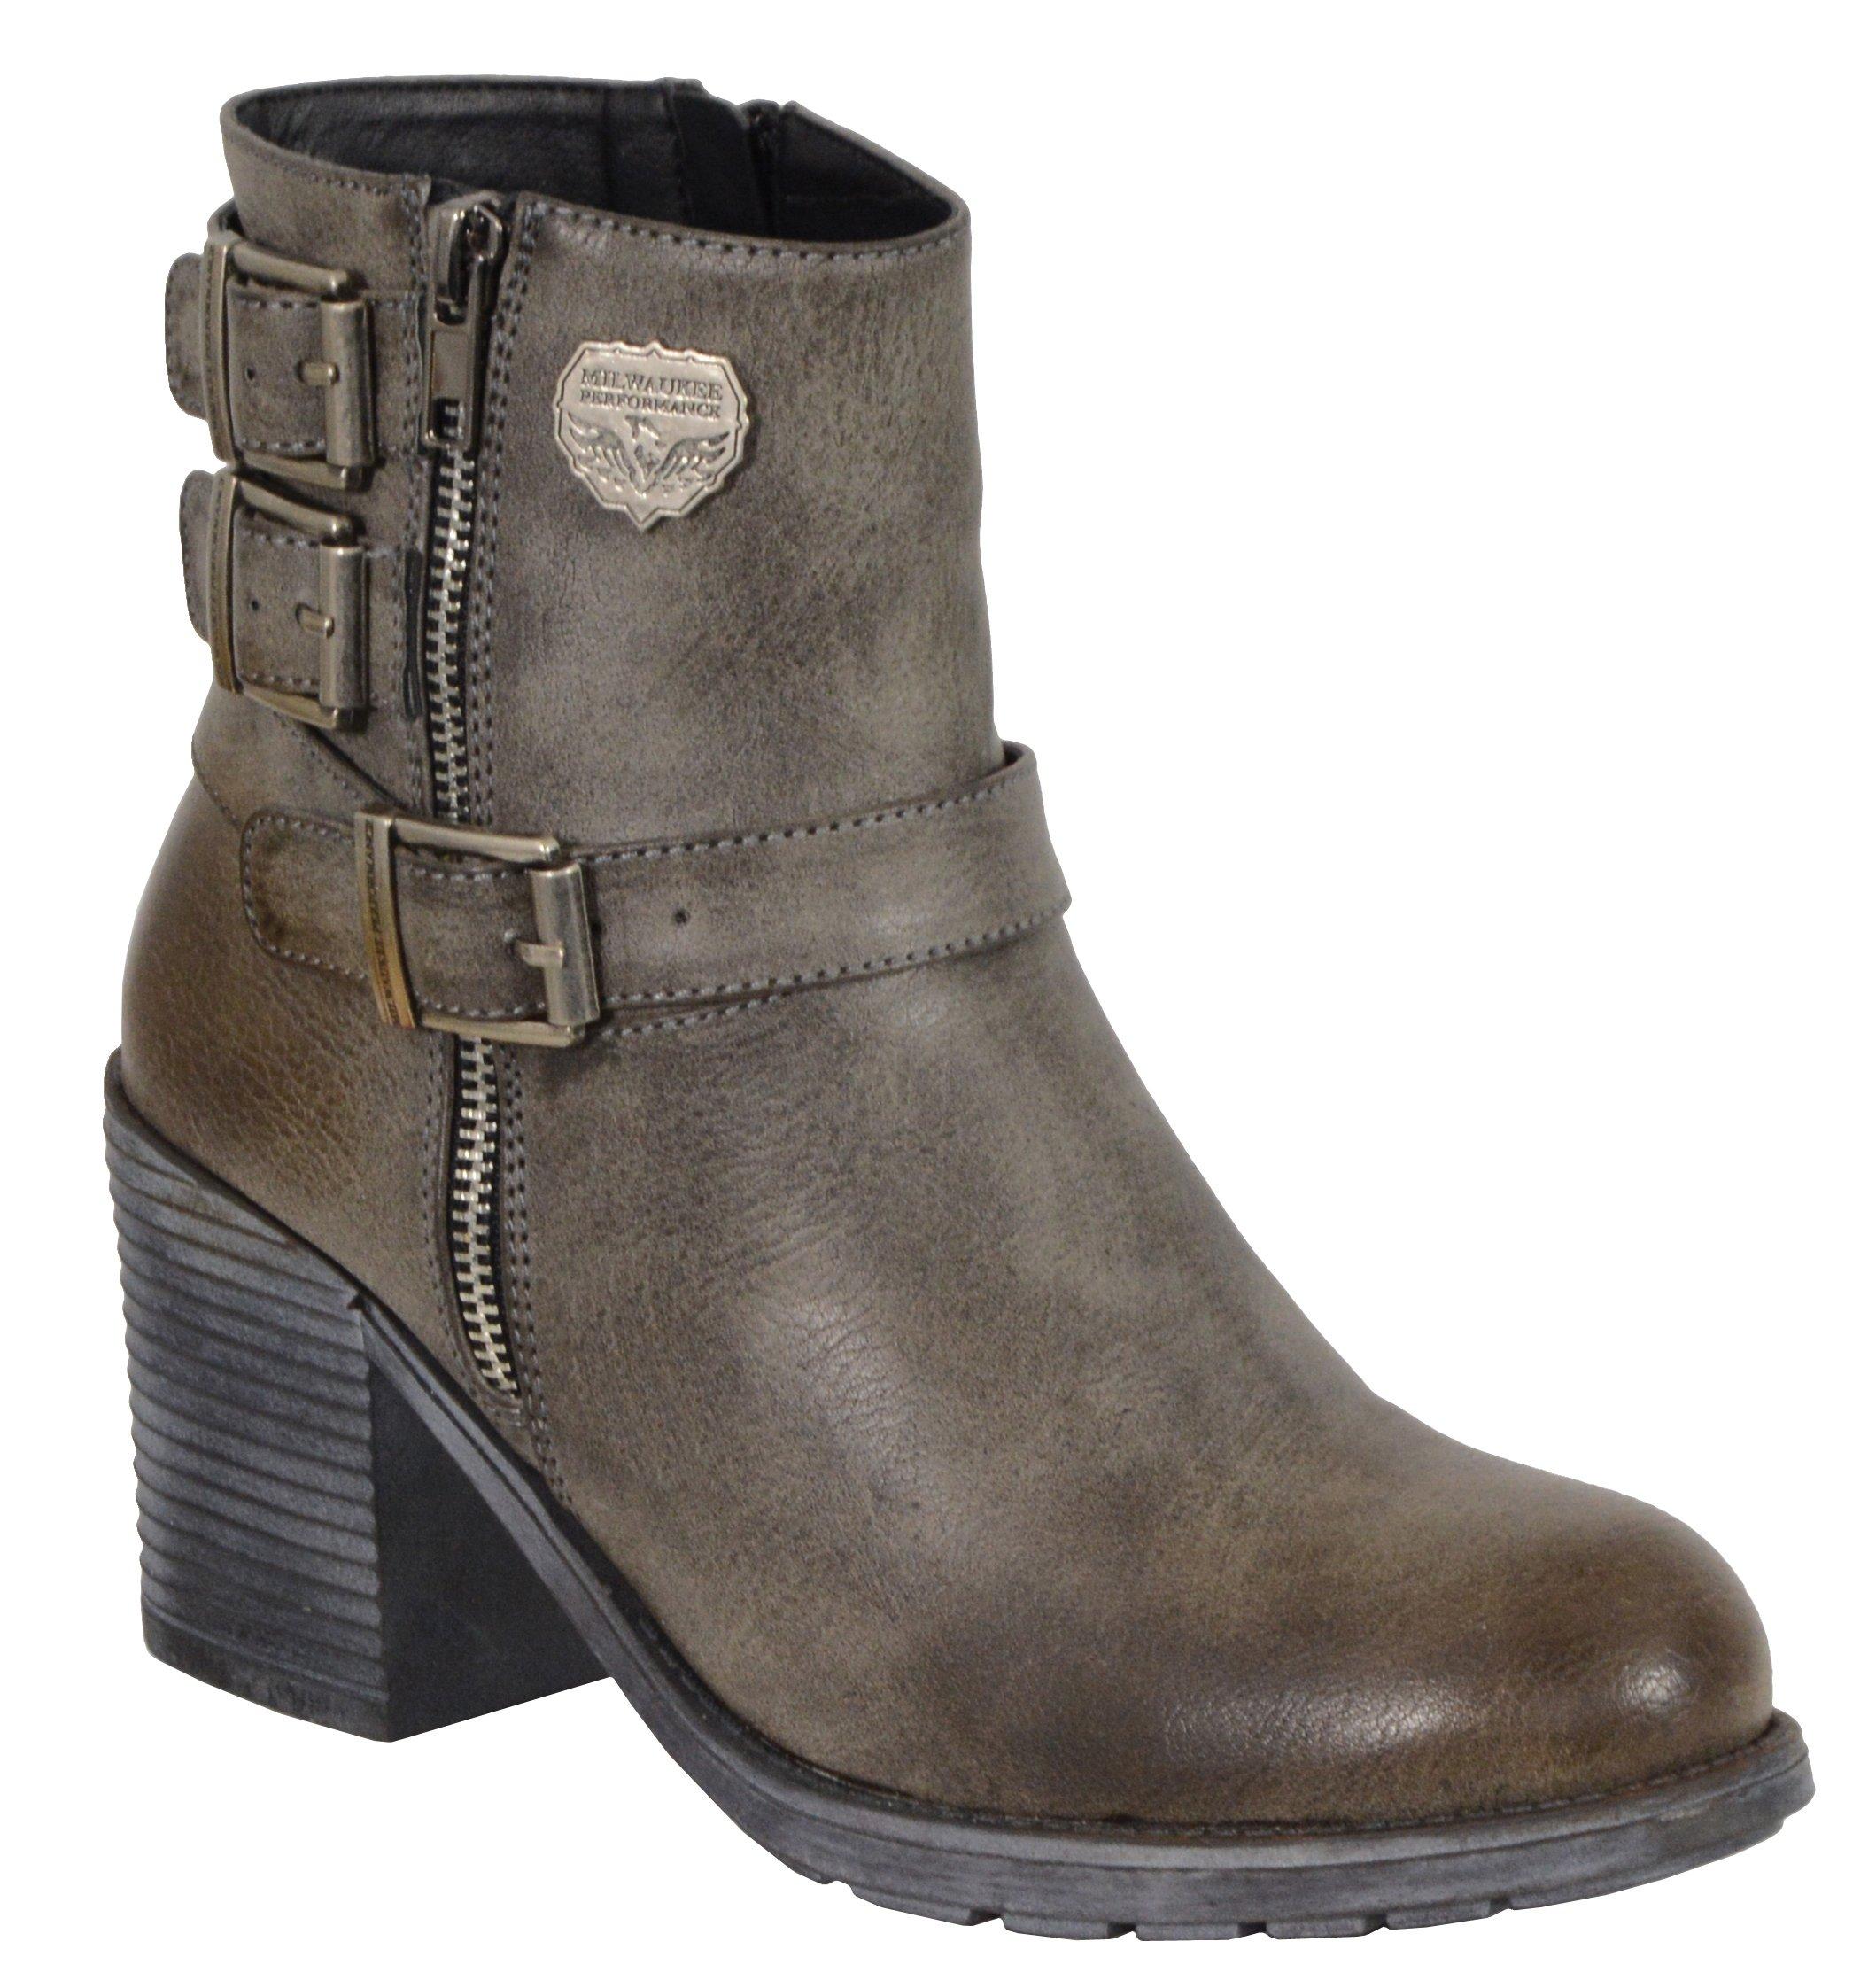 Milwaukee Performance Women's Triple Buckle Side Zip Boots with Platform Heel (Stone Grey, Size 8)